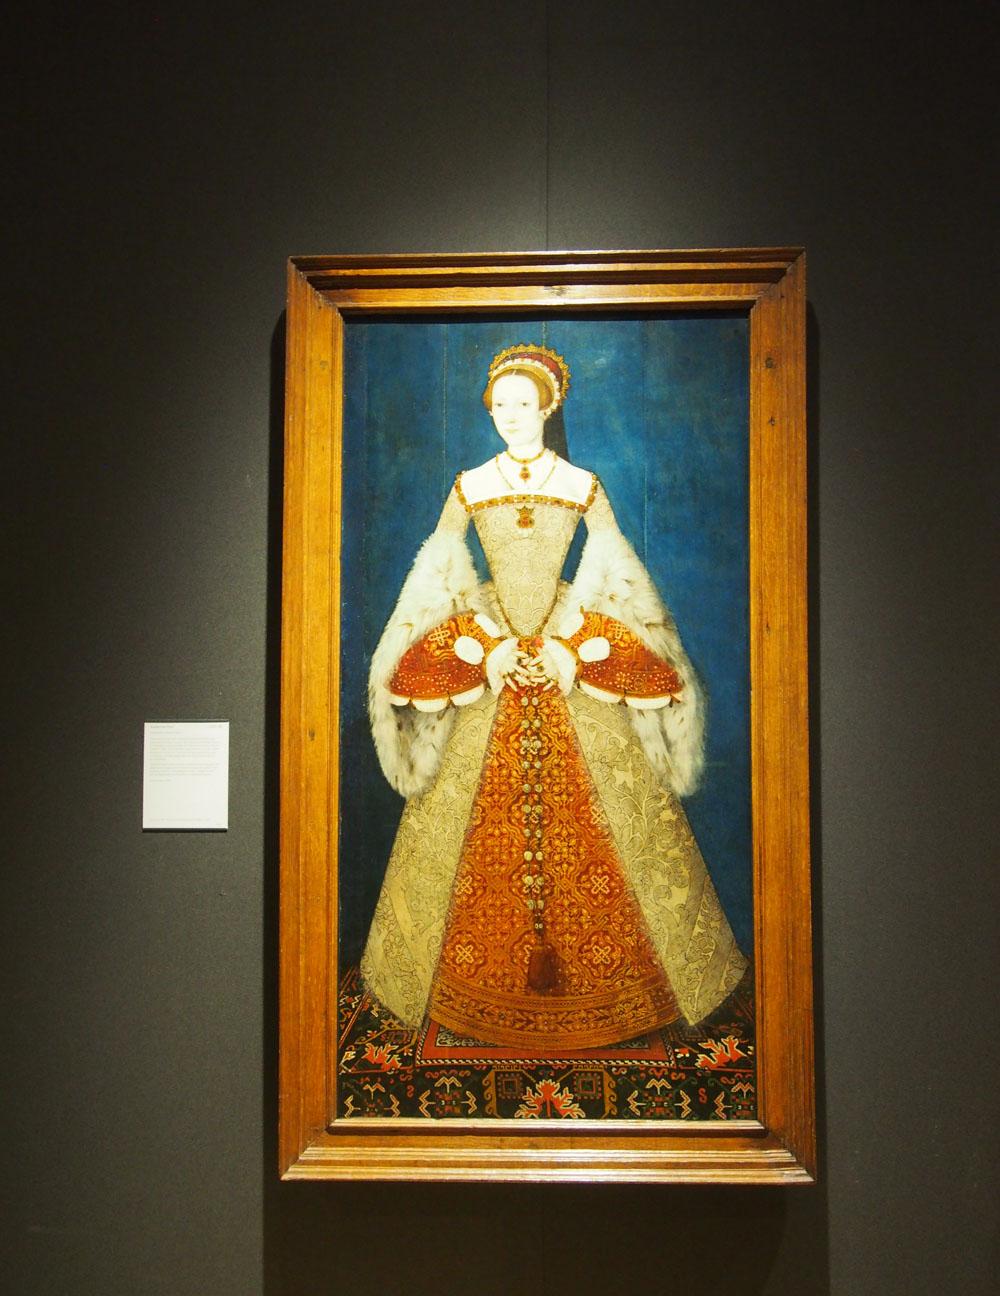 National Portrait Gallery de Londres Retrato tudor